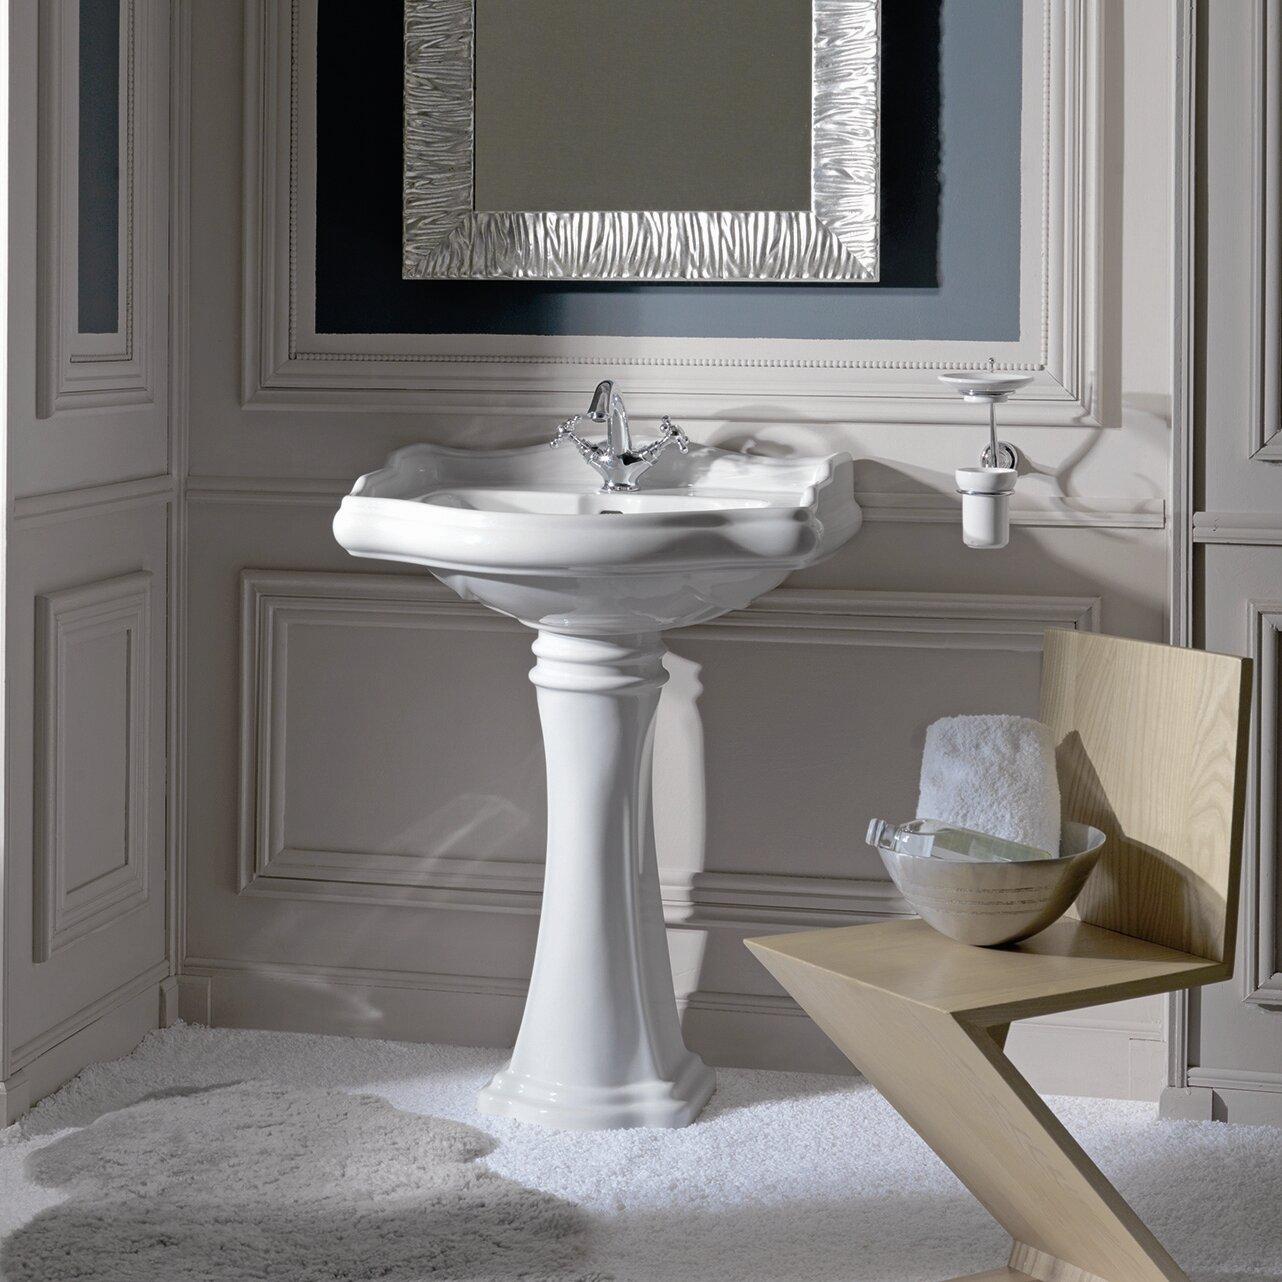 Kerasan Retro 33 9 Pedestal Sink Bathroom Sink With Overflow